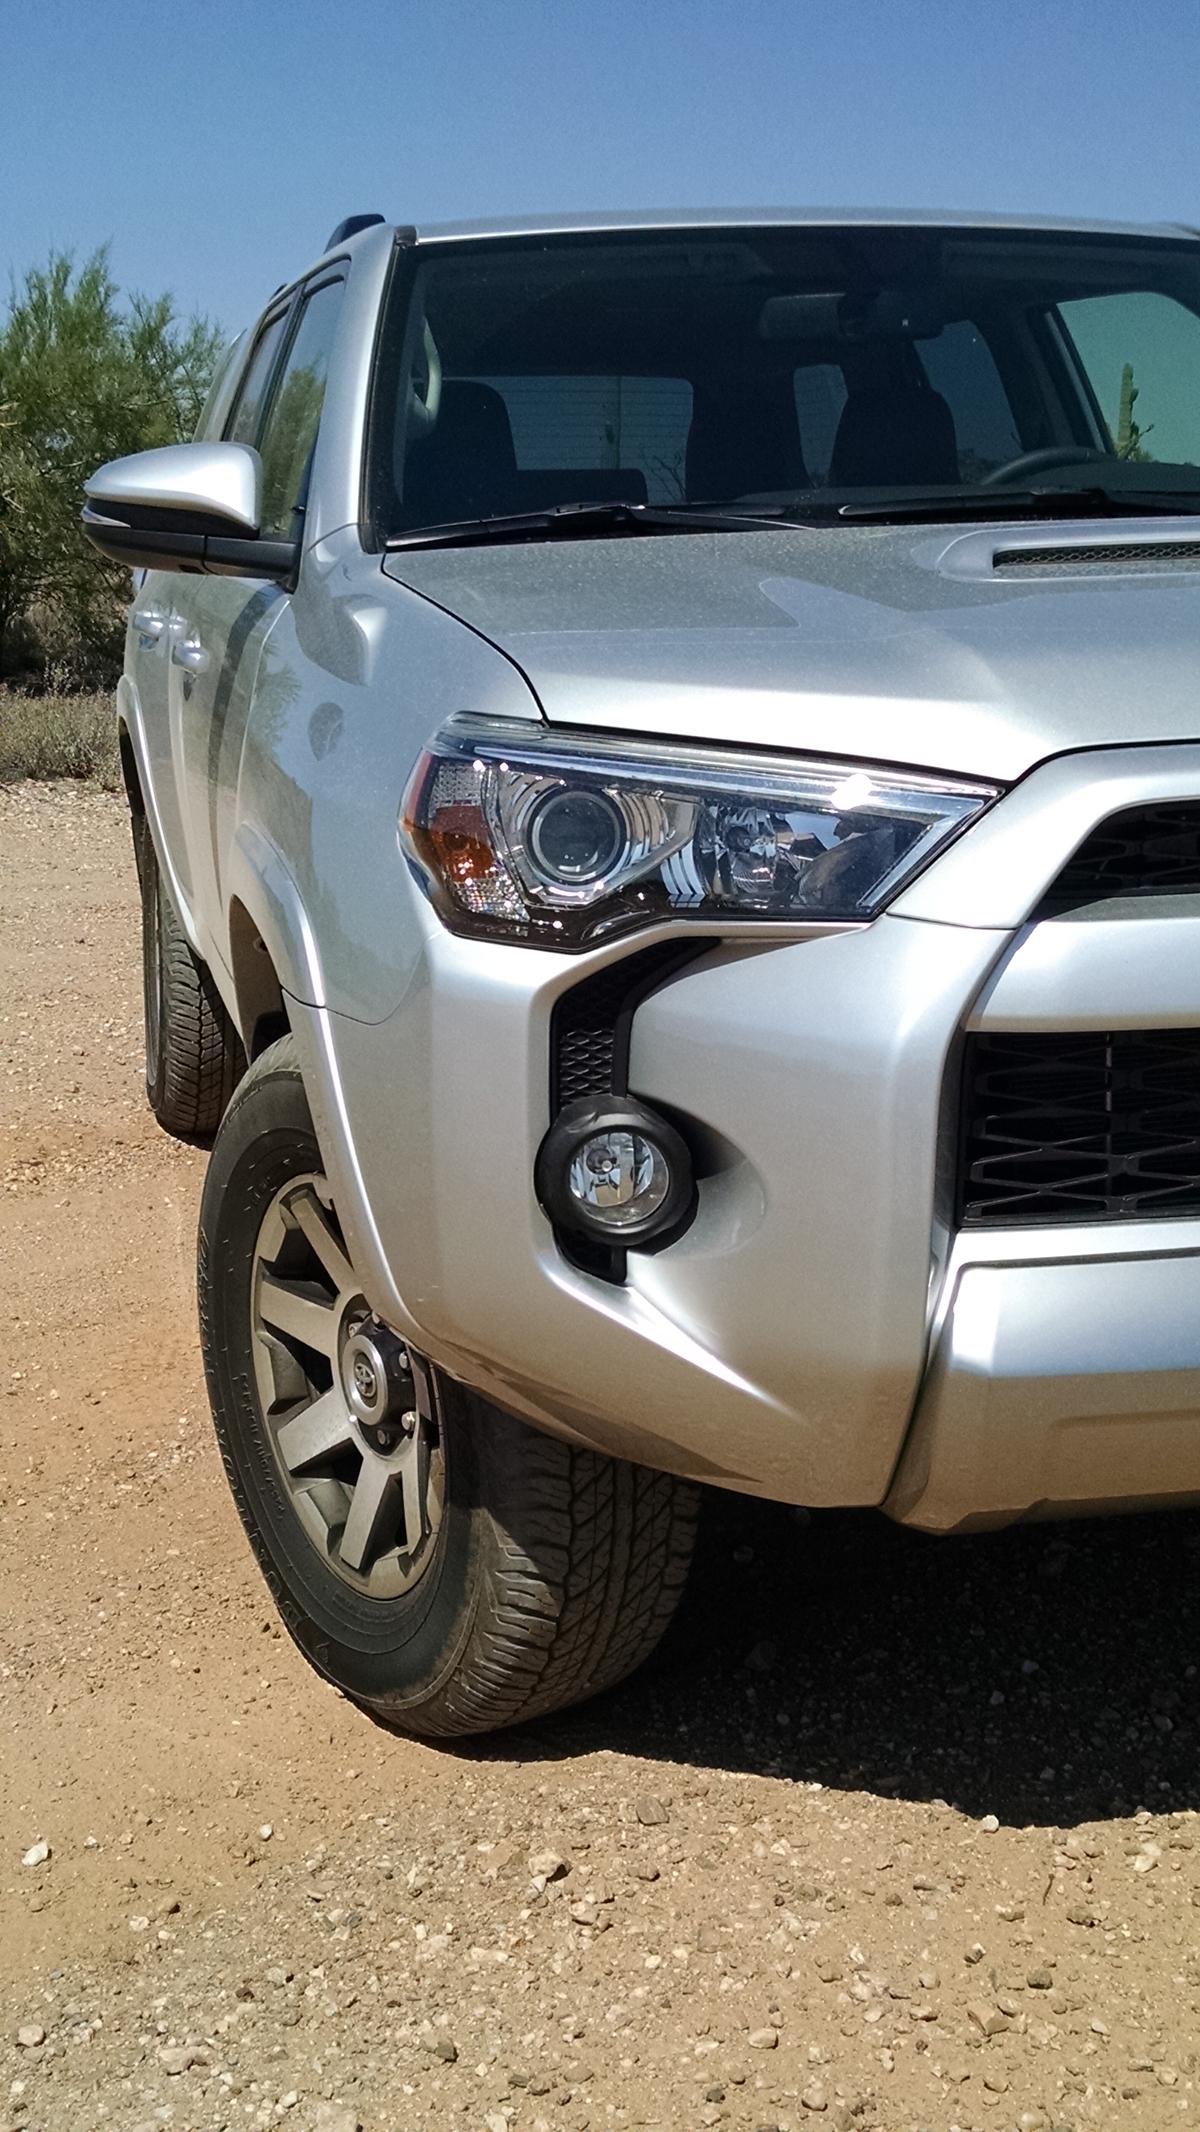 Carmax Toyota 4Runner >> Test Drive: 2018 Toyota 4Runner TRD OffRoad - TestDriven.TV